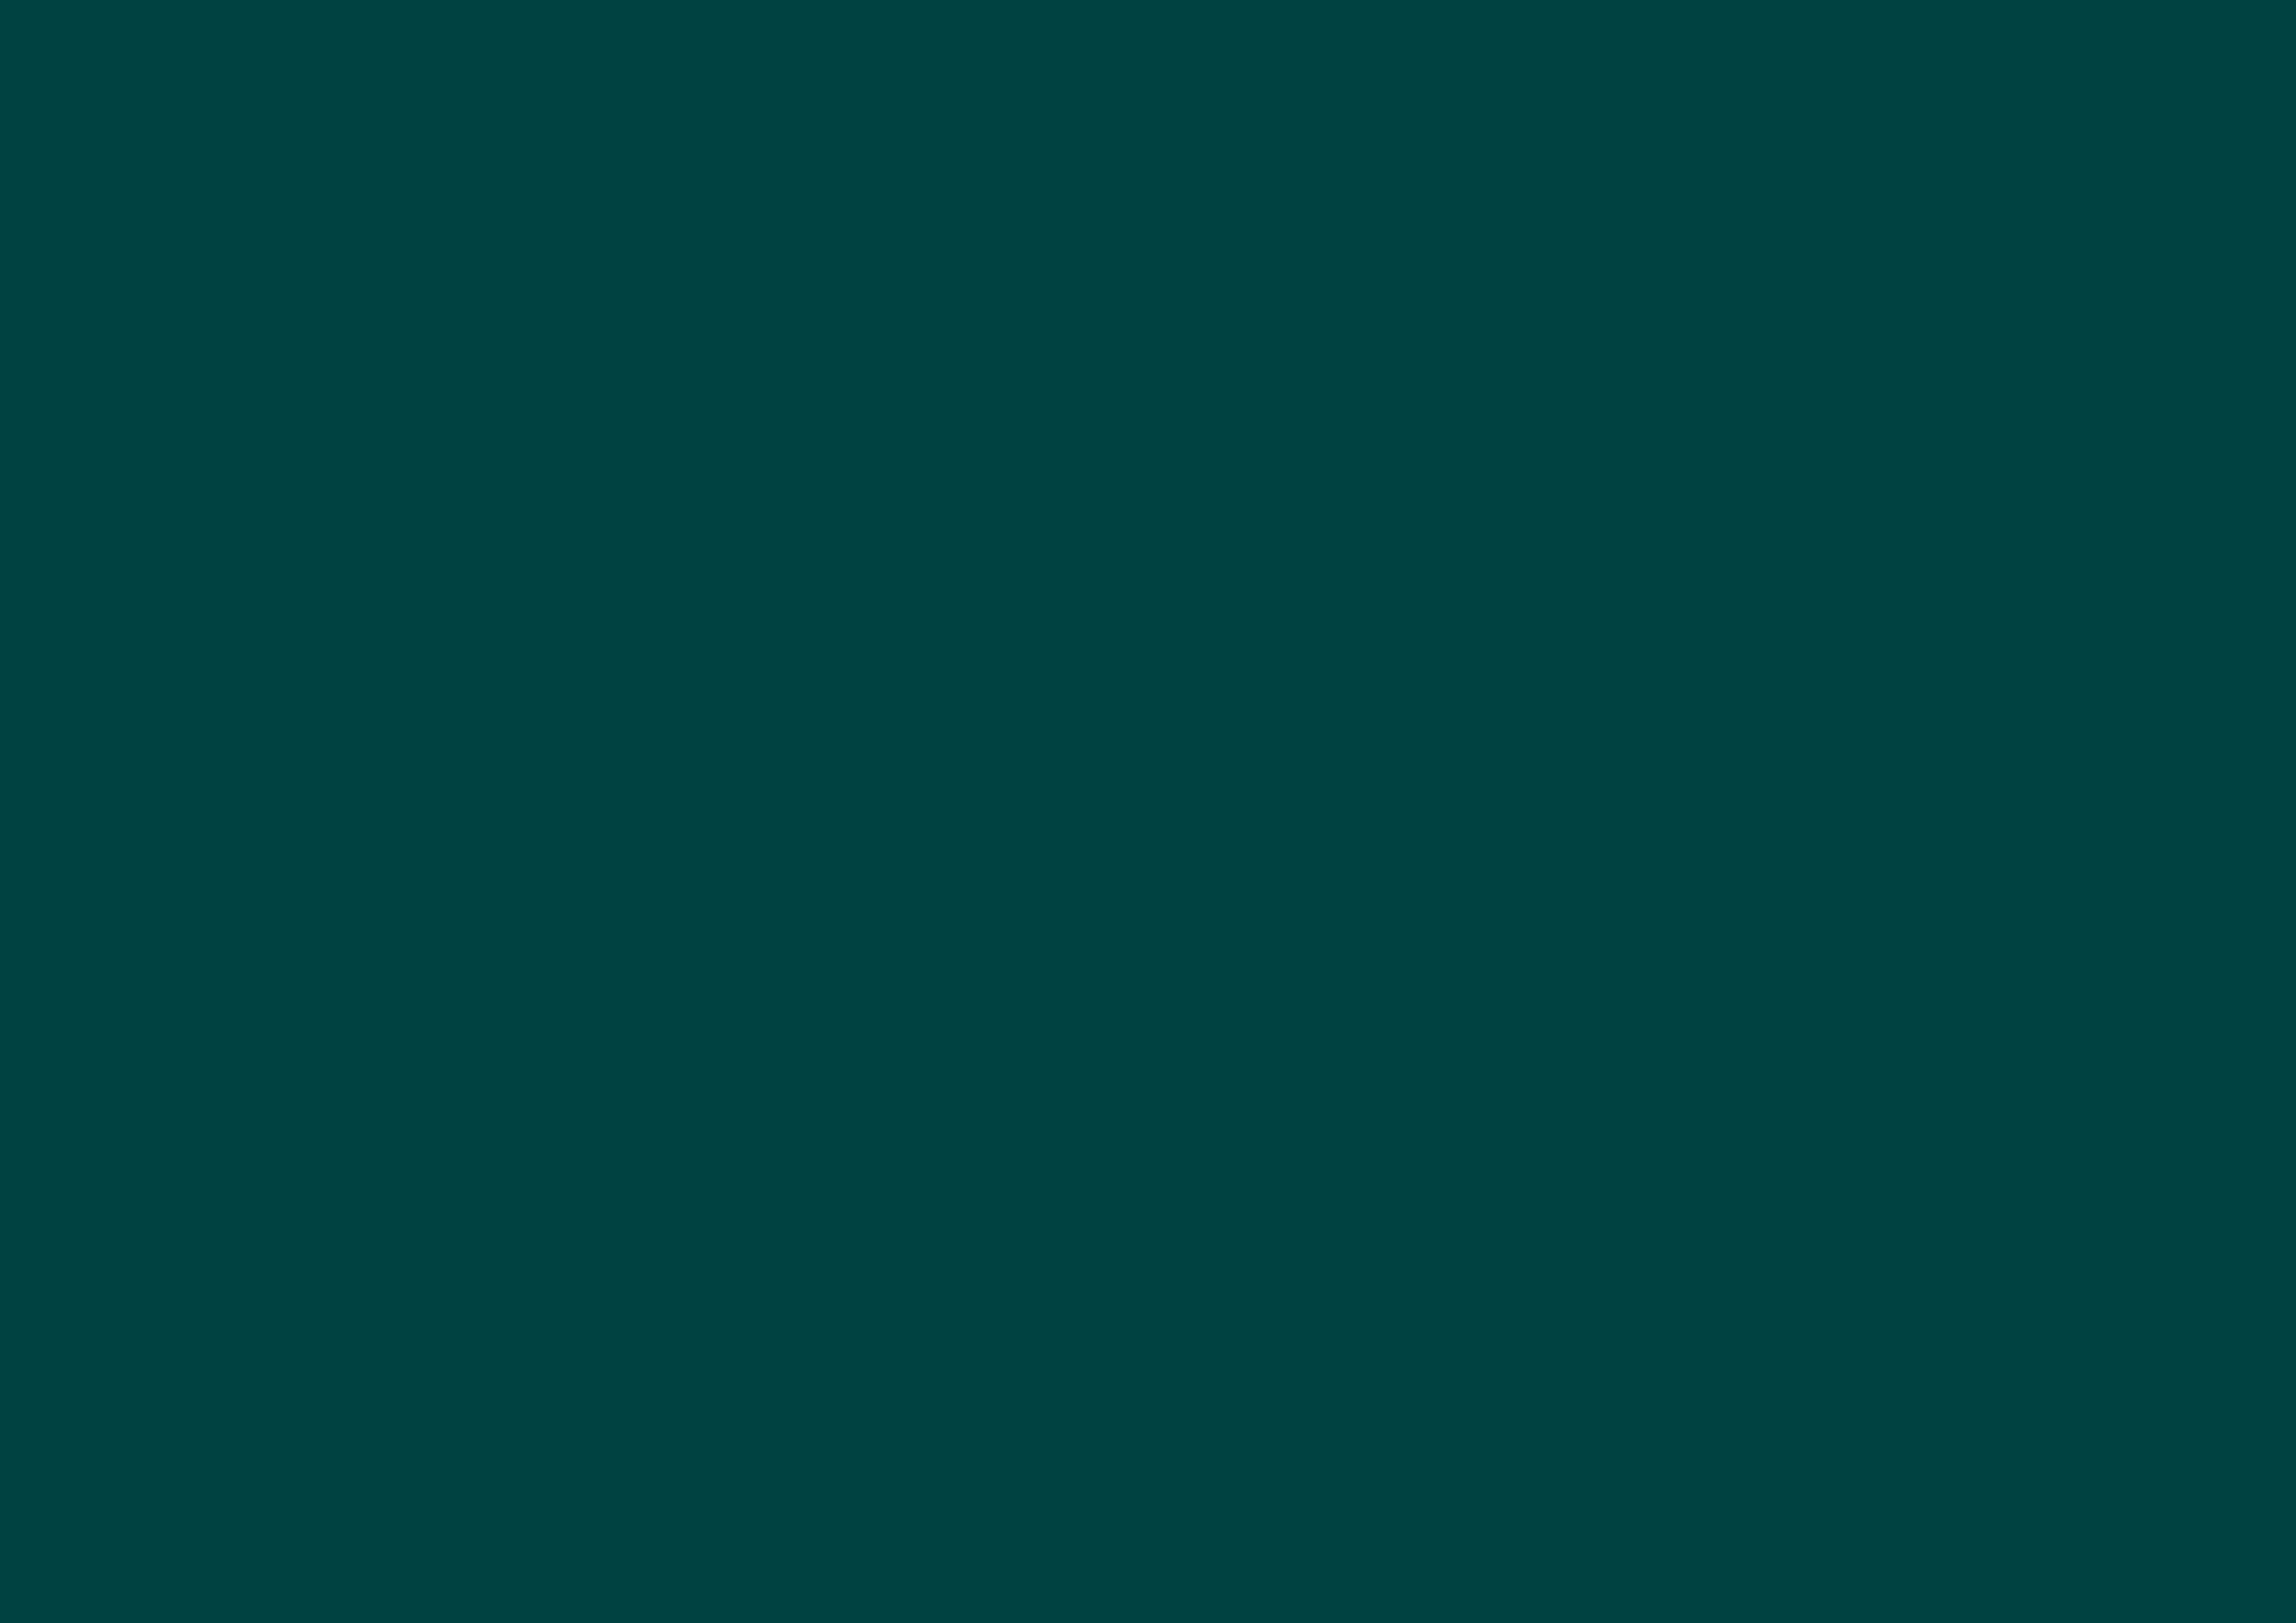 3508x2480 Warm Black Solid Color Background